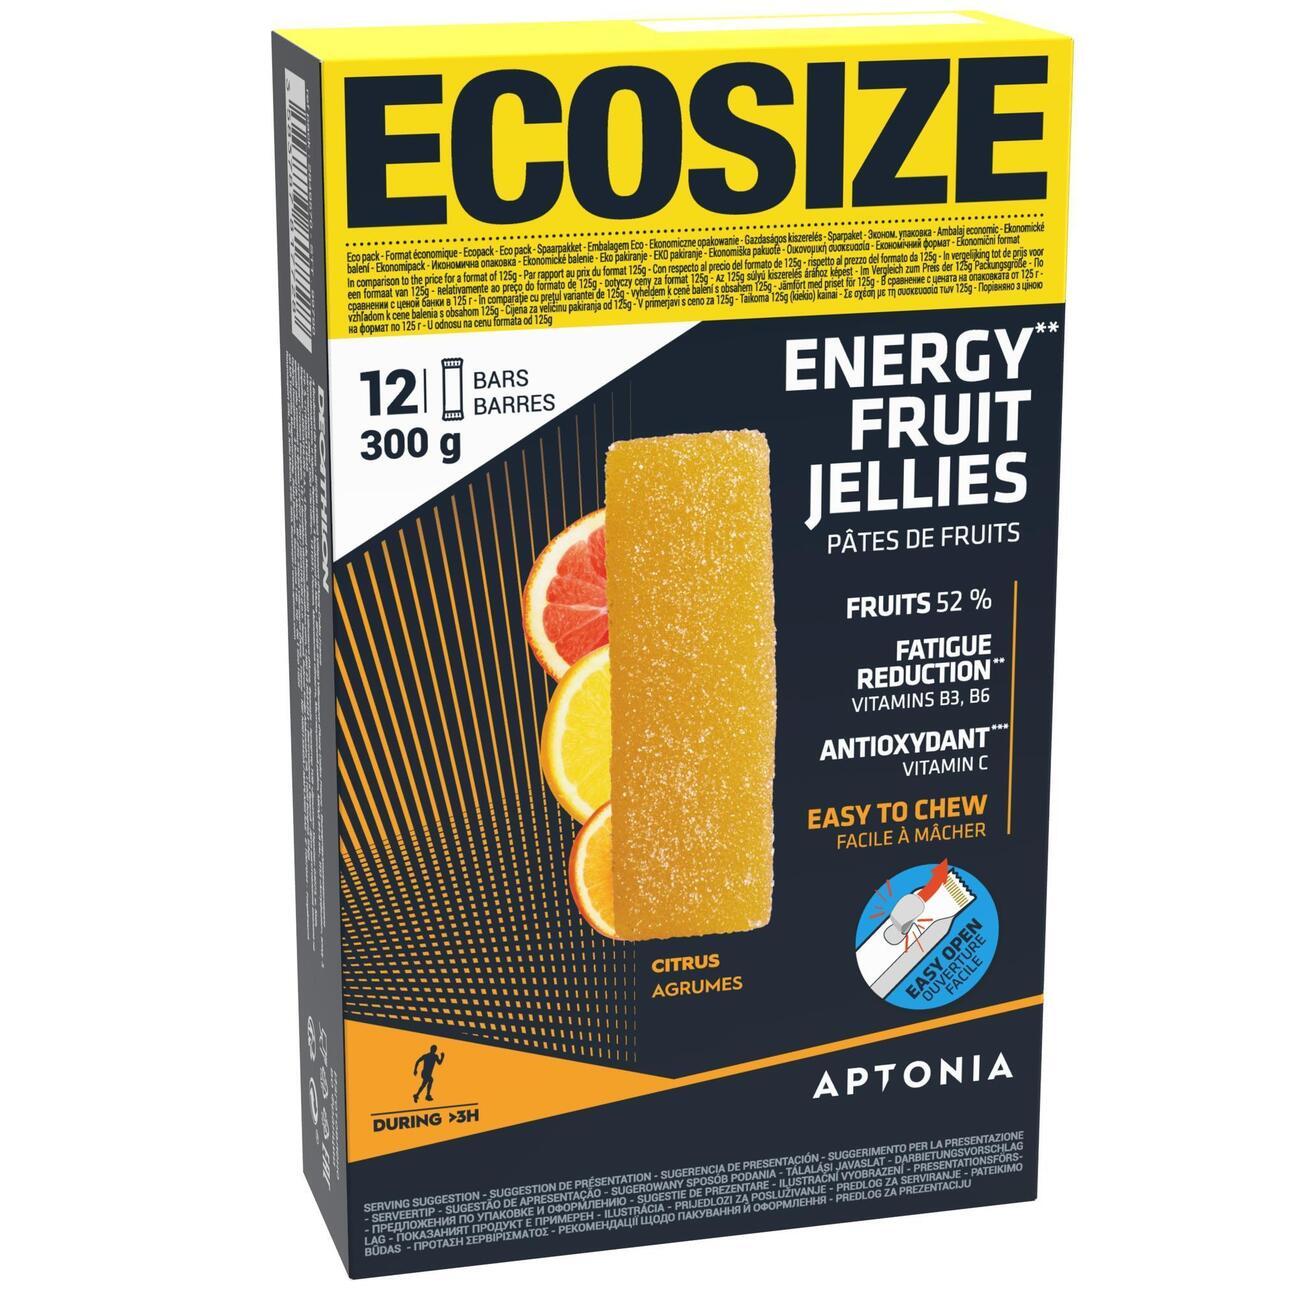 pate-de-fruits-energy-fruit-jellies-ecosize-agrumes-12-x-25g